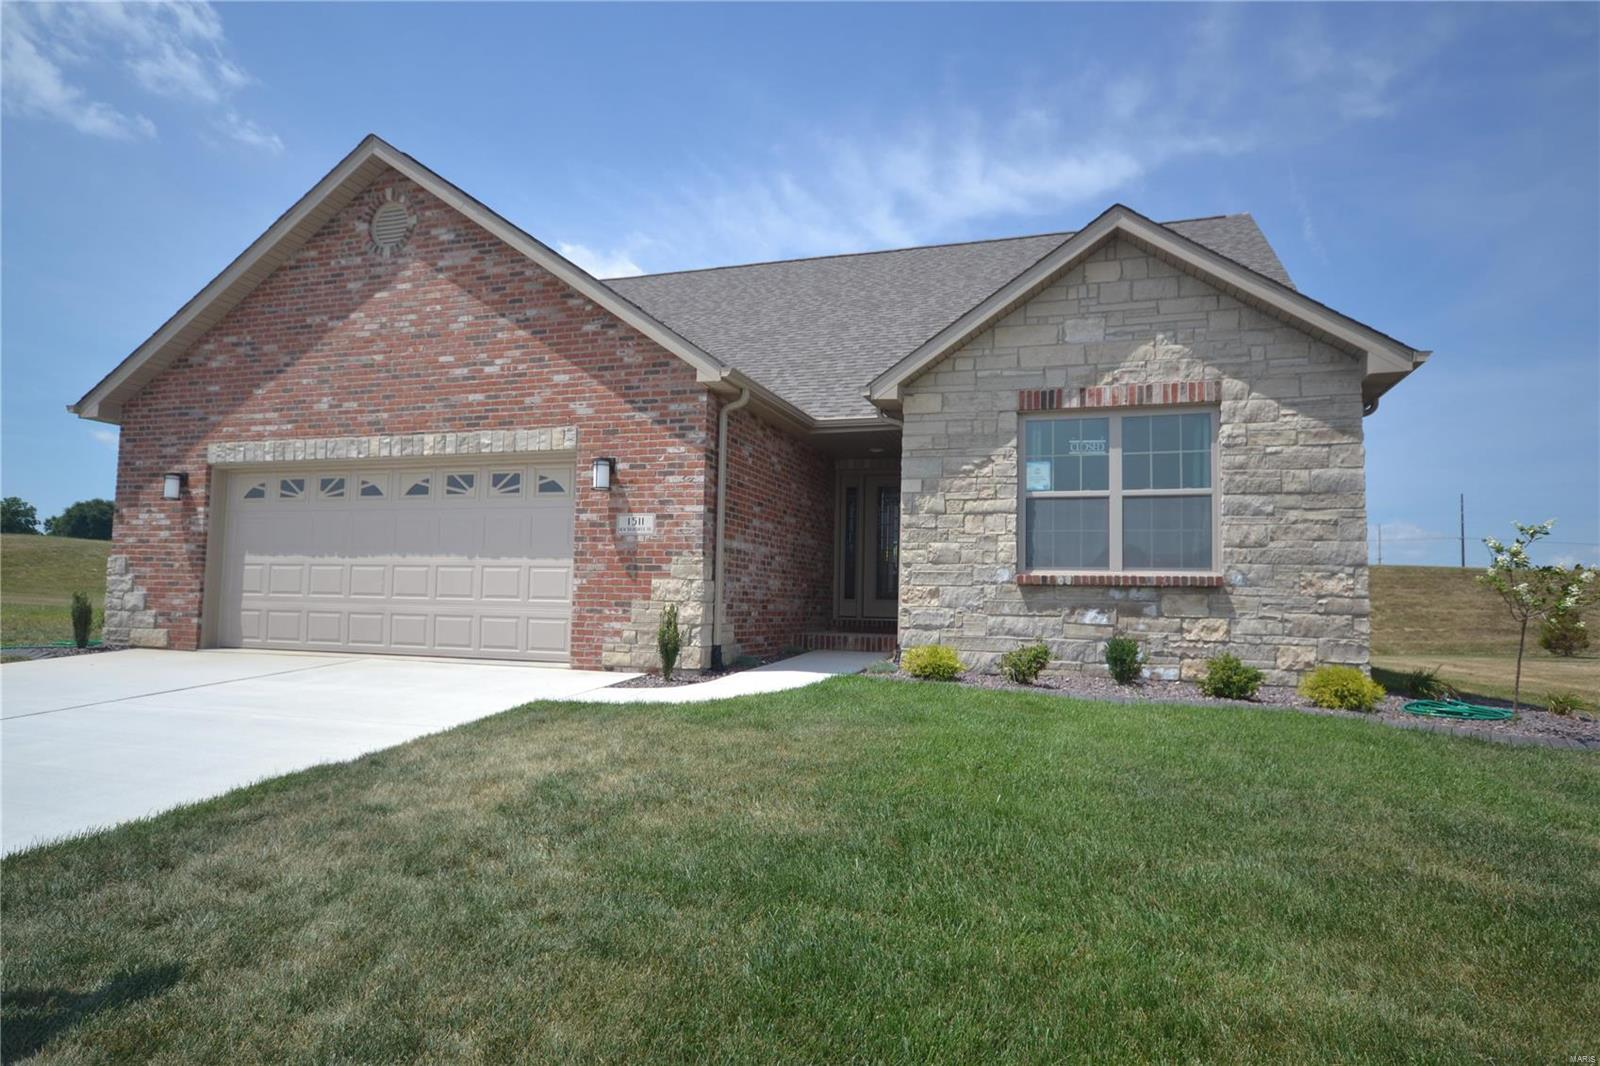 4404 TBB Devin Drive Property Photo - Smithton, IL real estate listing